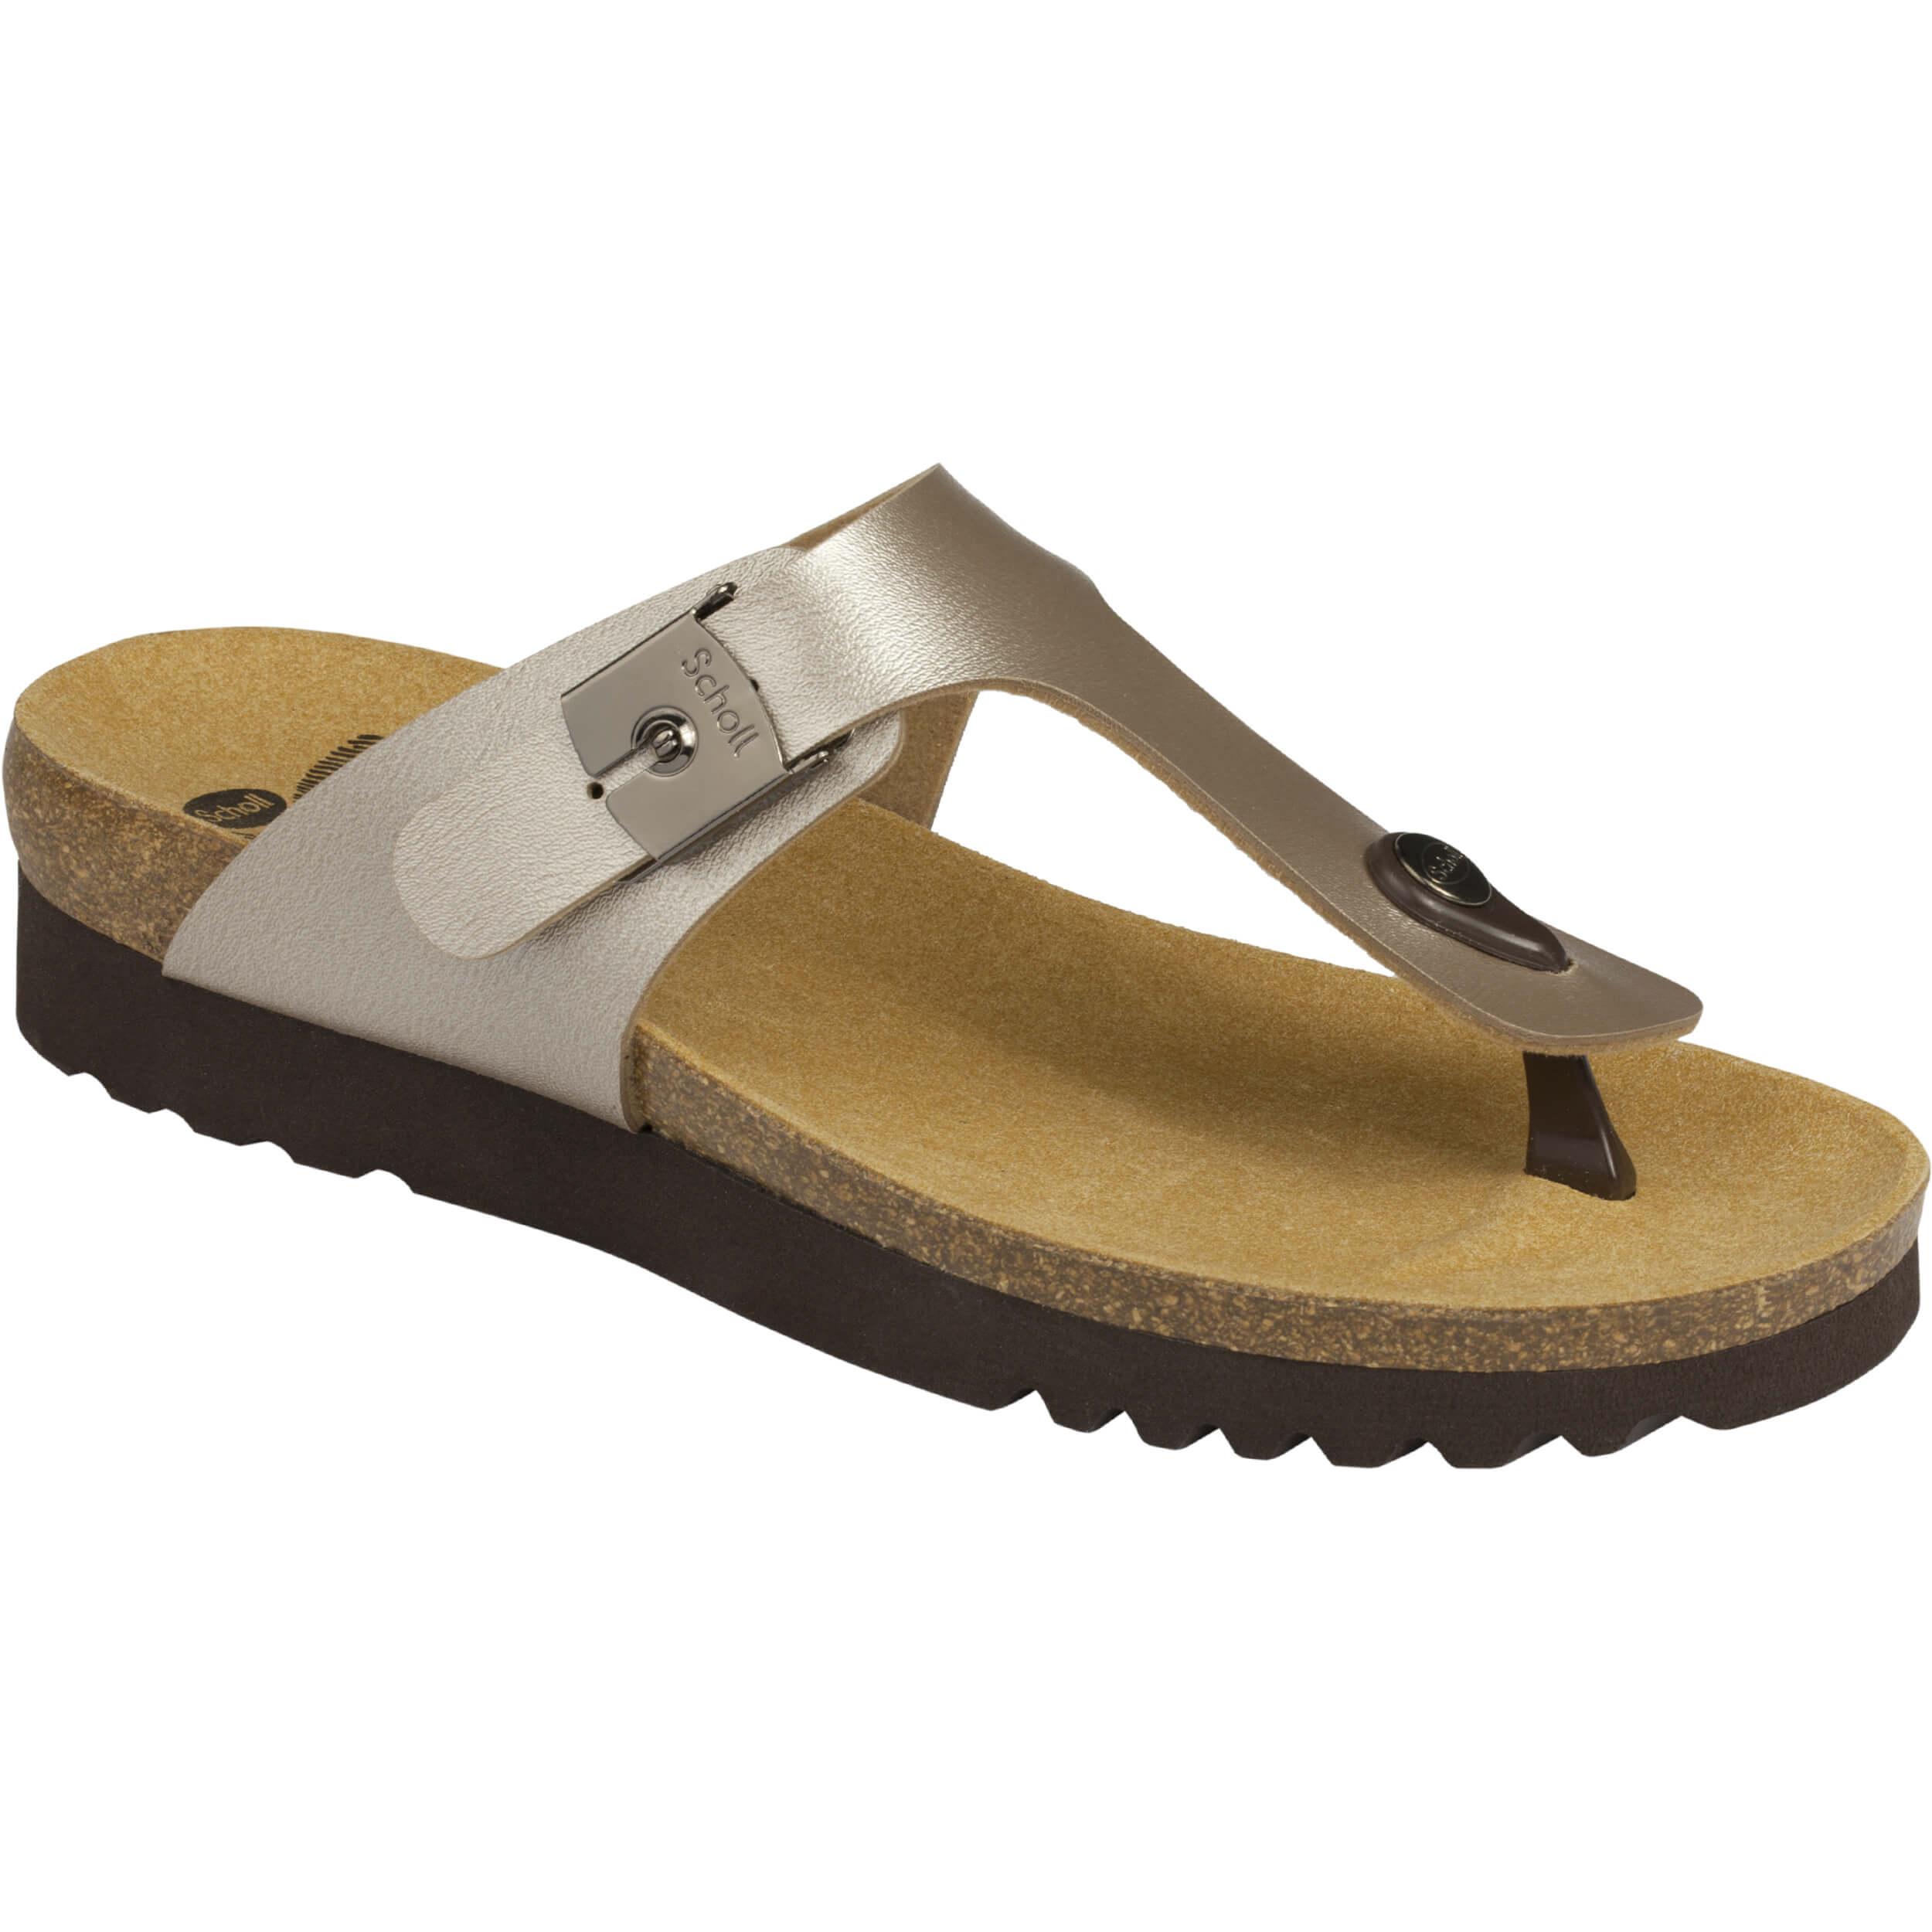 Dr Scholl Shoes Boa Vista Up Γκρι ΝΕΟ Γυναικεία Ανατομικά Παπούτσια Χαρίζουν Σωσ φαρμακείο   ανατομικά παπούτσια   γυναικεία ανατομικά παπούτσια